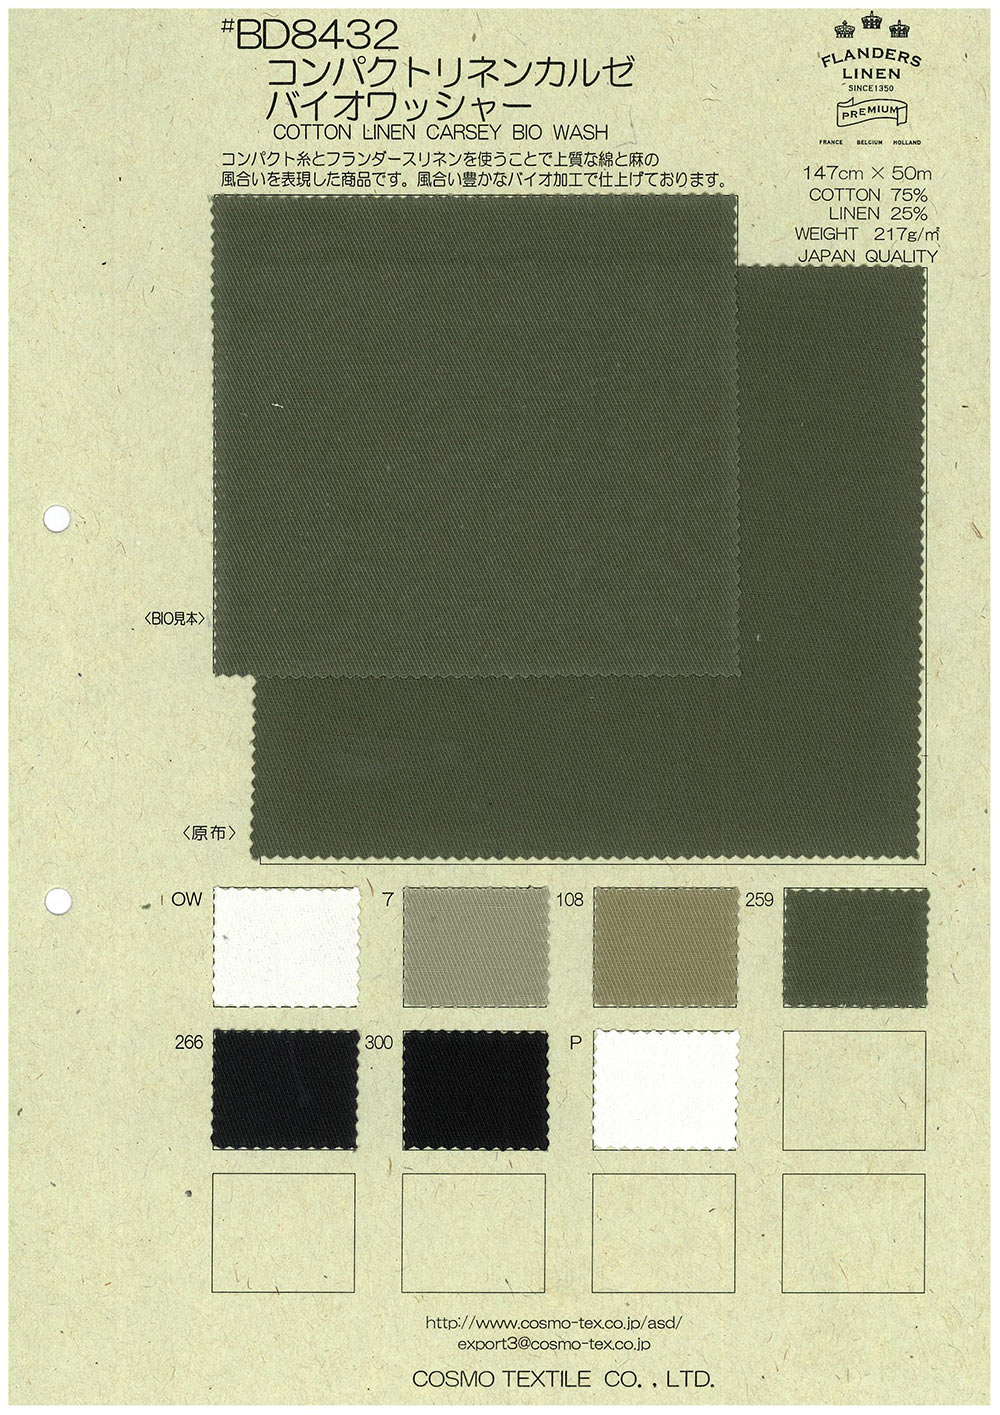 BD8432 C/リネンカルゼBW[生地] コスモテキスタイル/オークラ商事 - ApparelX アパレル資材卸通販